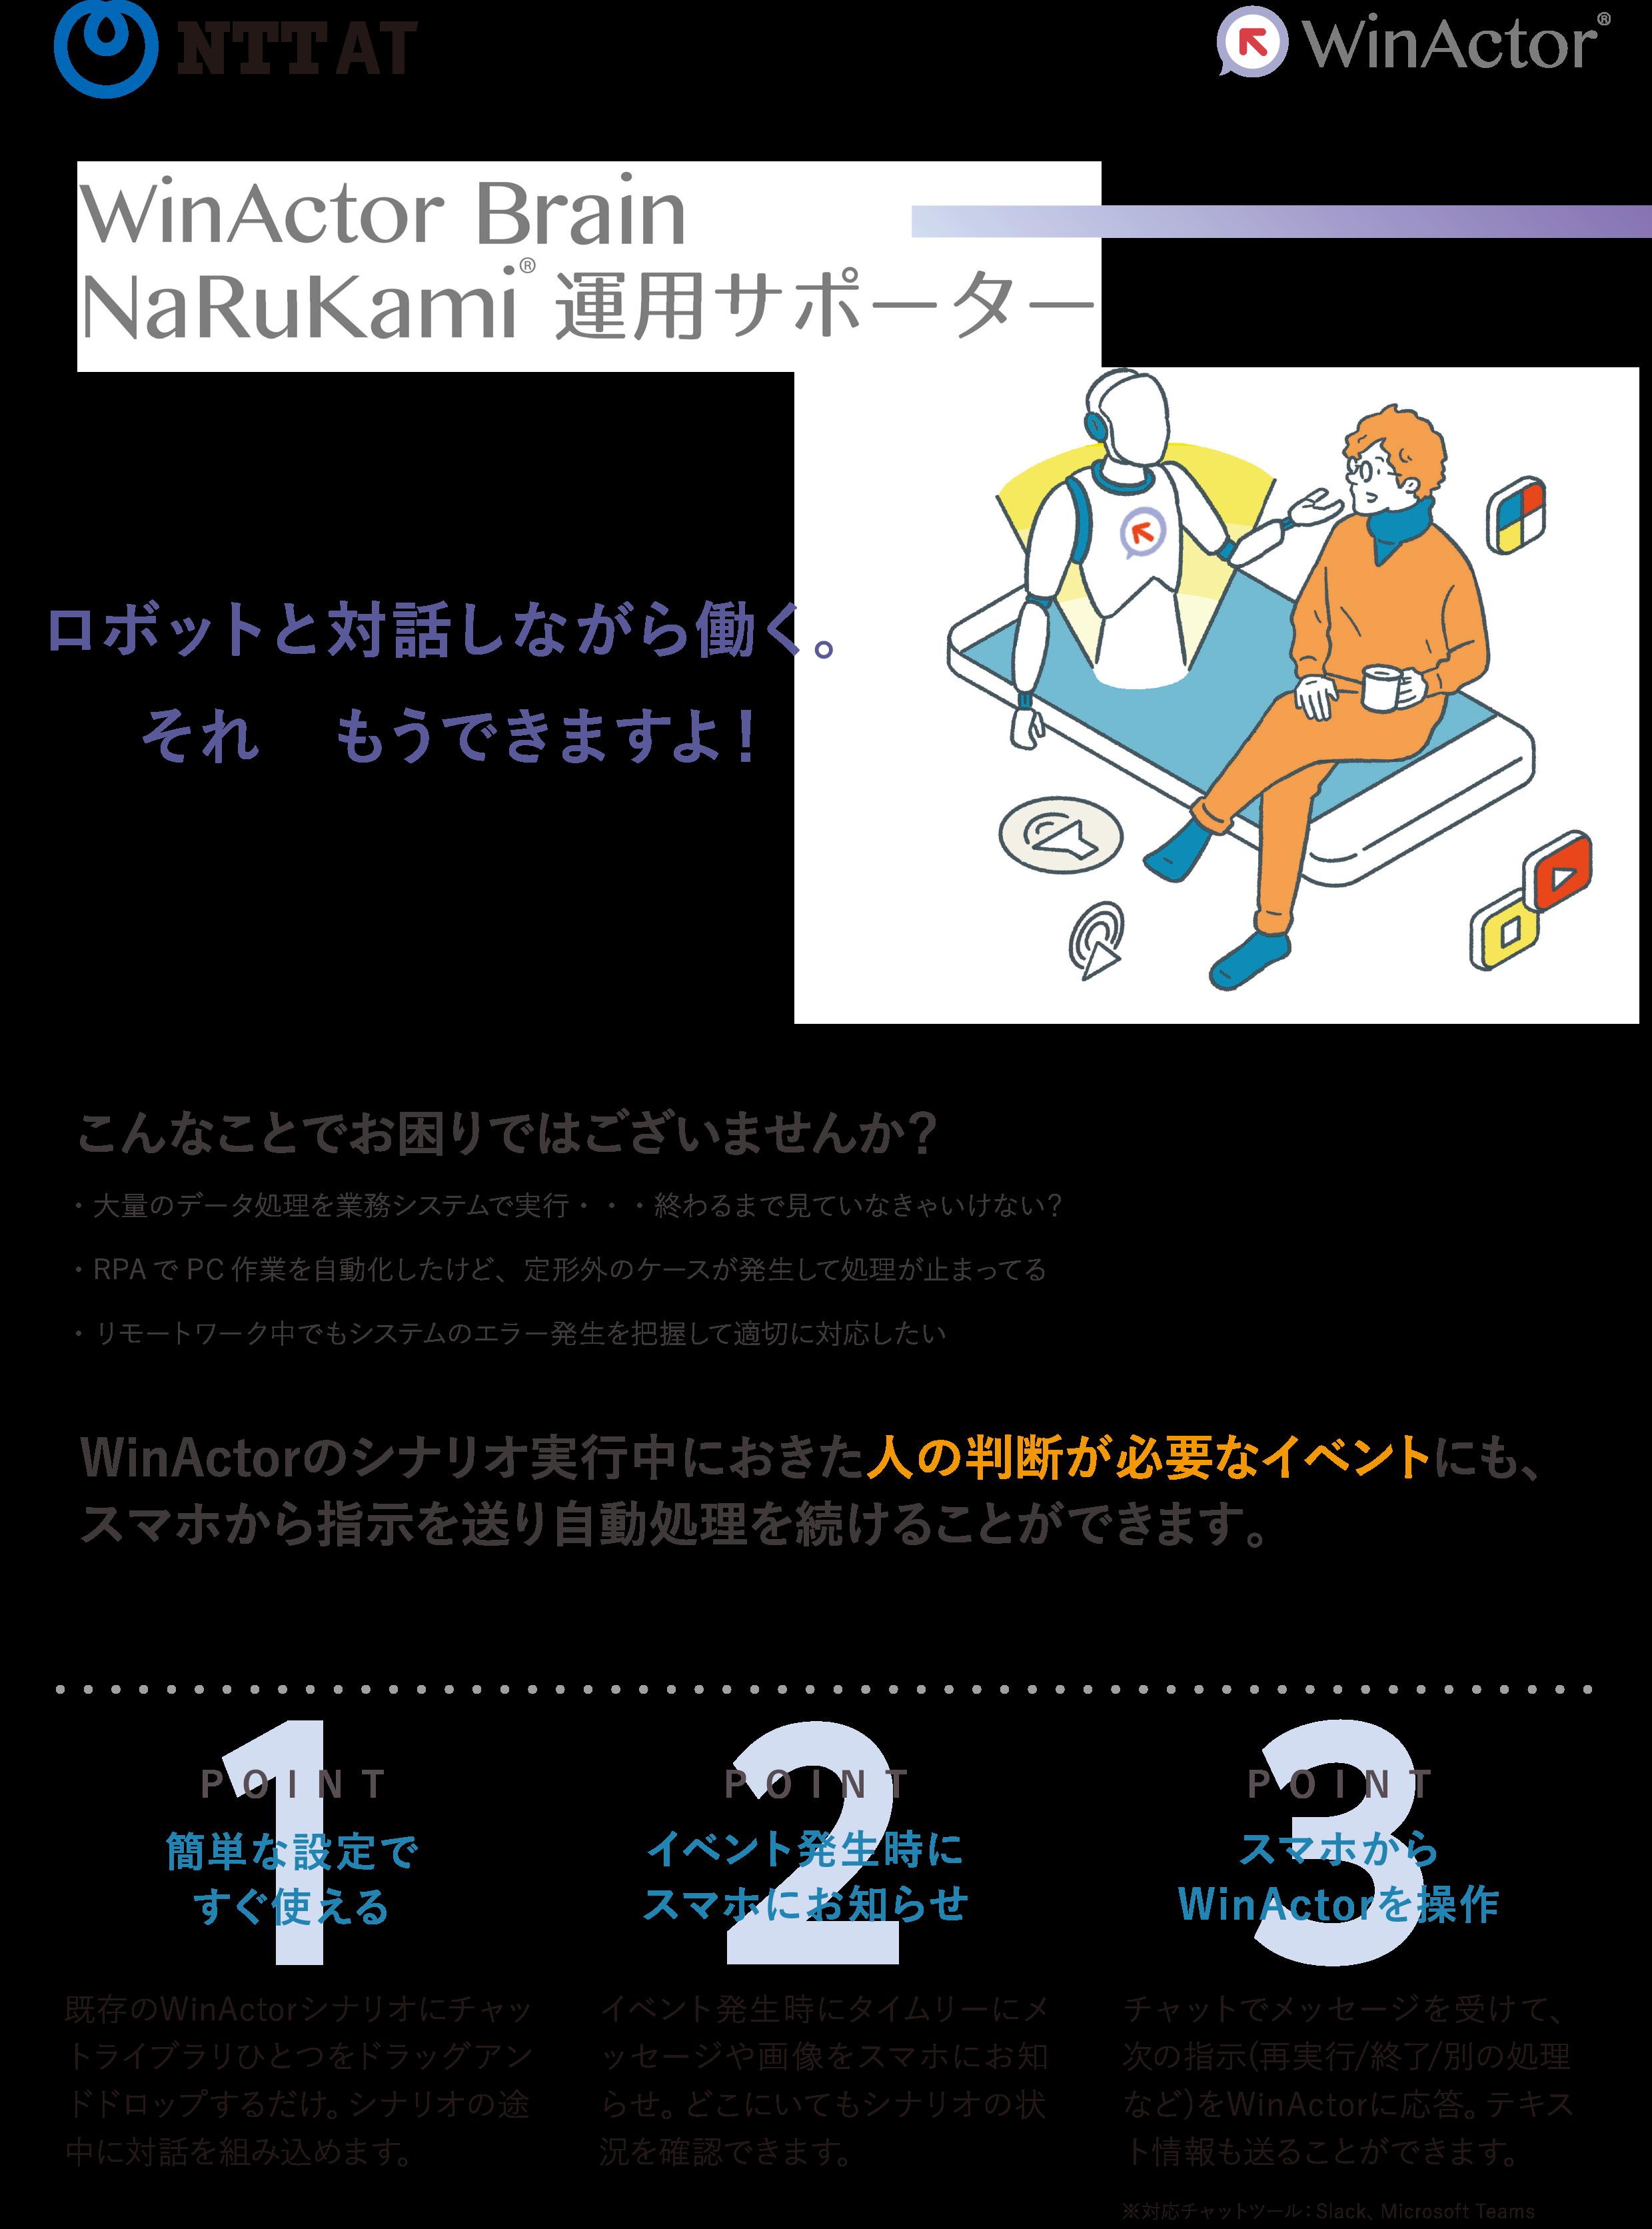 WinActor Brain NaRuKami運用サポーター パンフレット